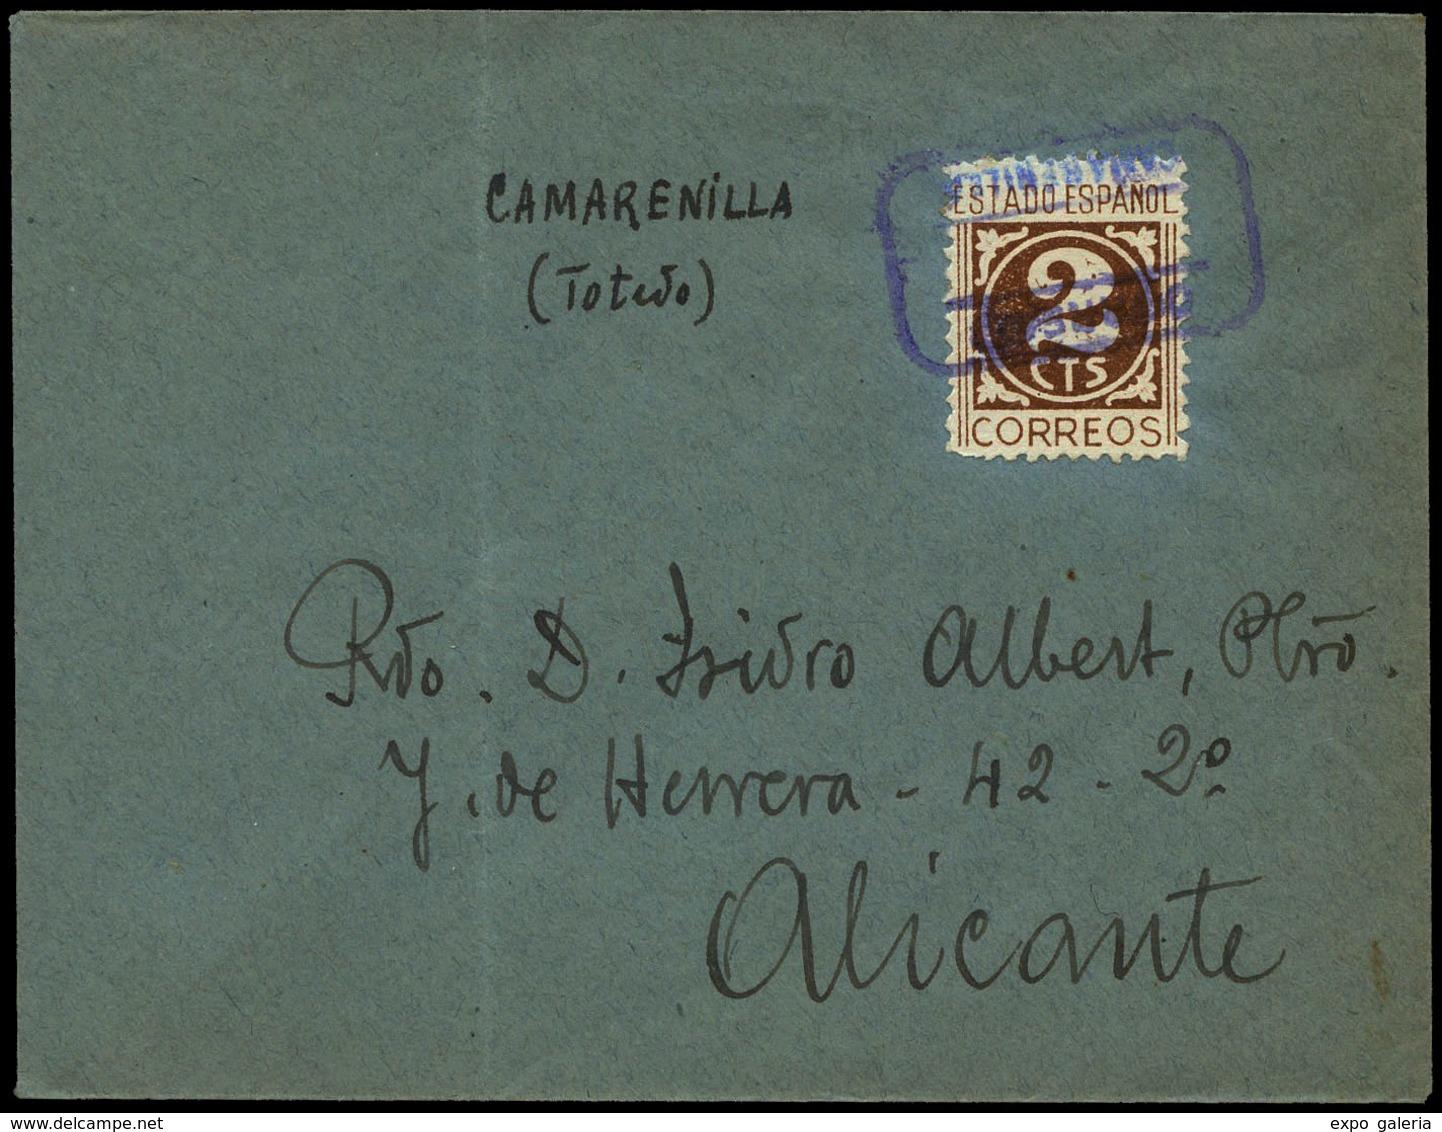 Ed. 819 - CAMARENILLA.Toledo. Carta Cda A Alicante. Carteria Especial.Lujo. - Espagne